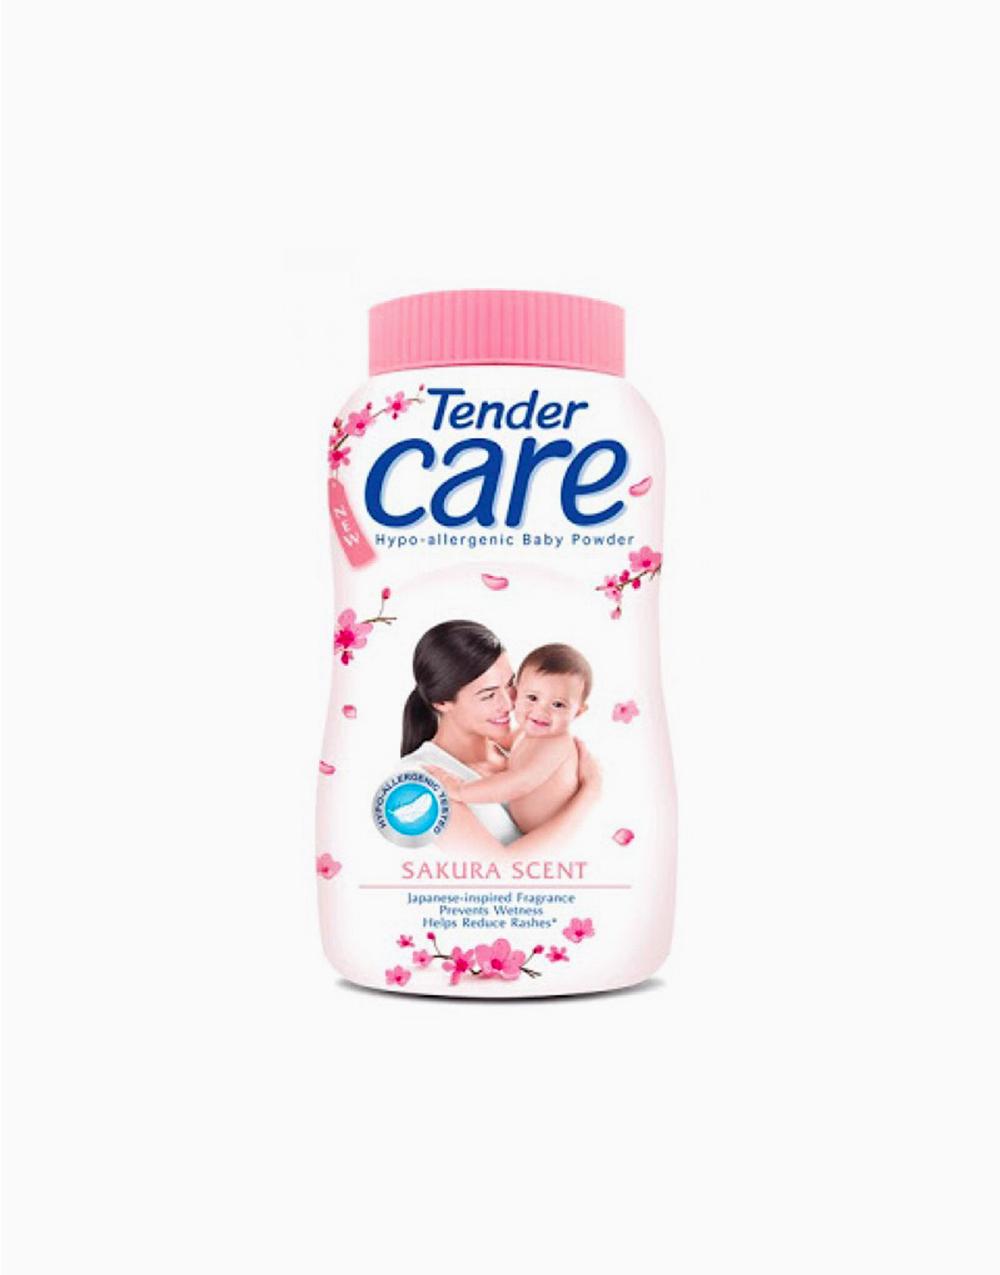 Sakura Scent Hypo-Allergenic Baby Talc (100g) by Tender Care